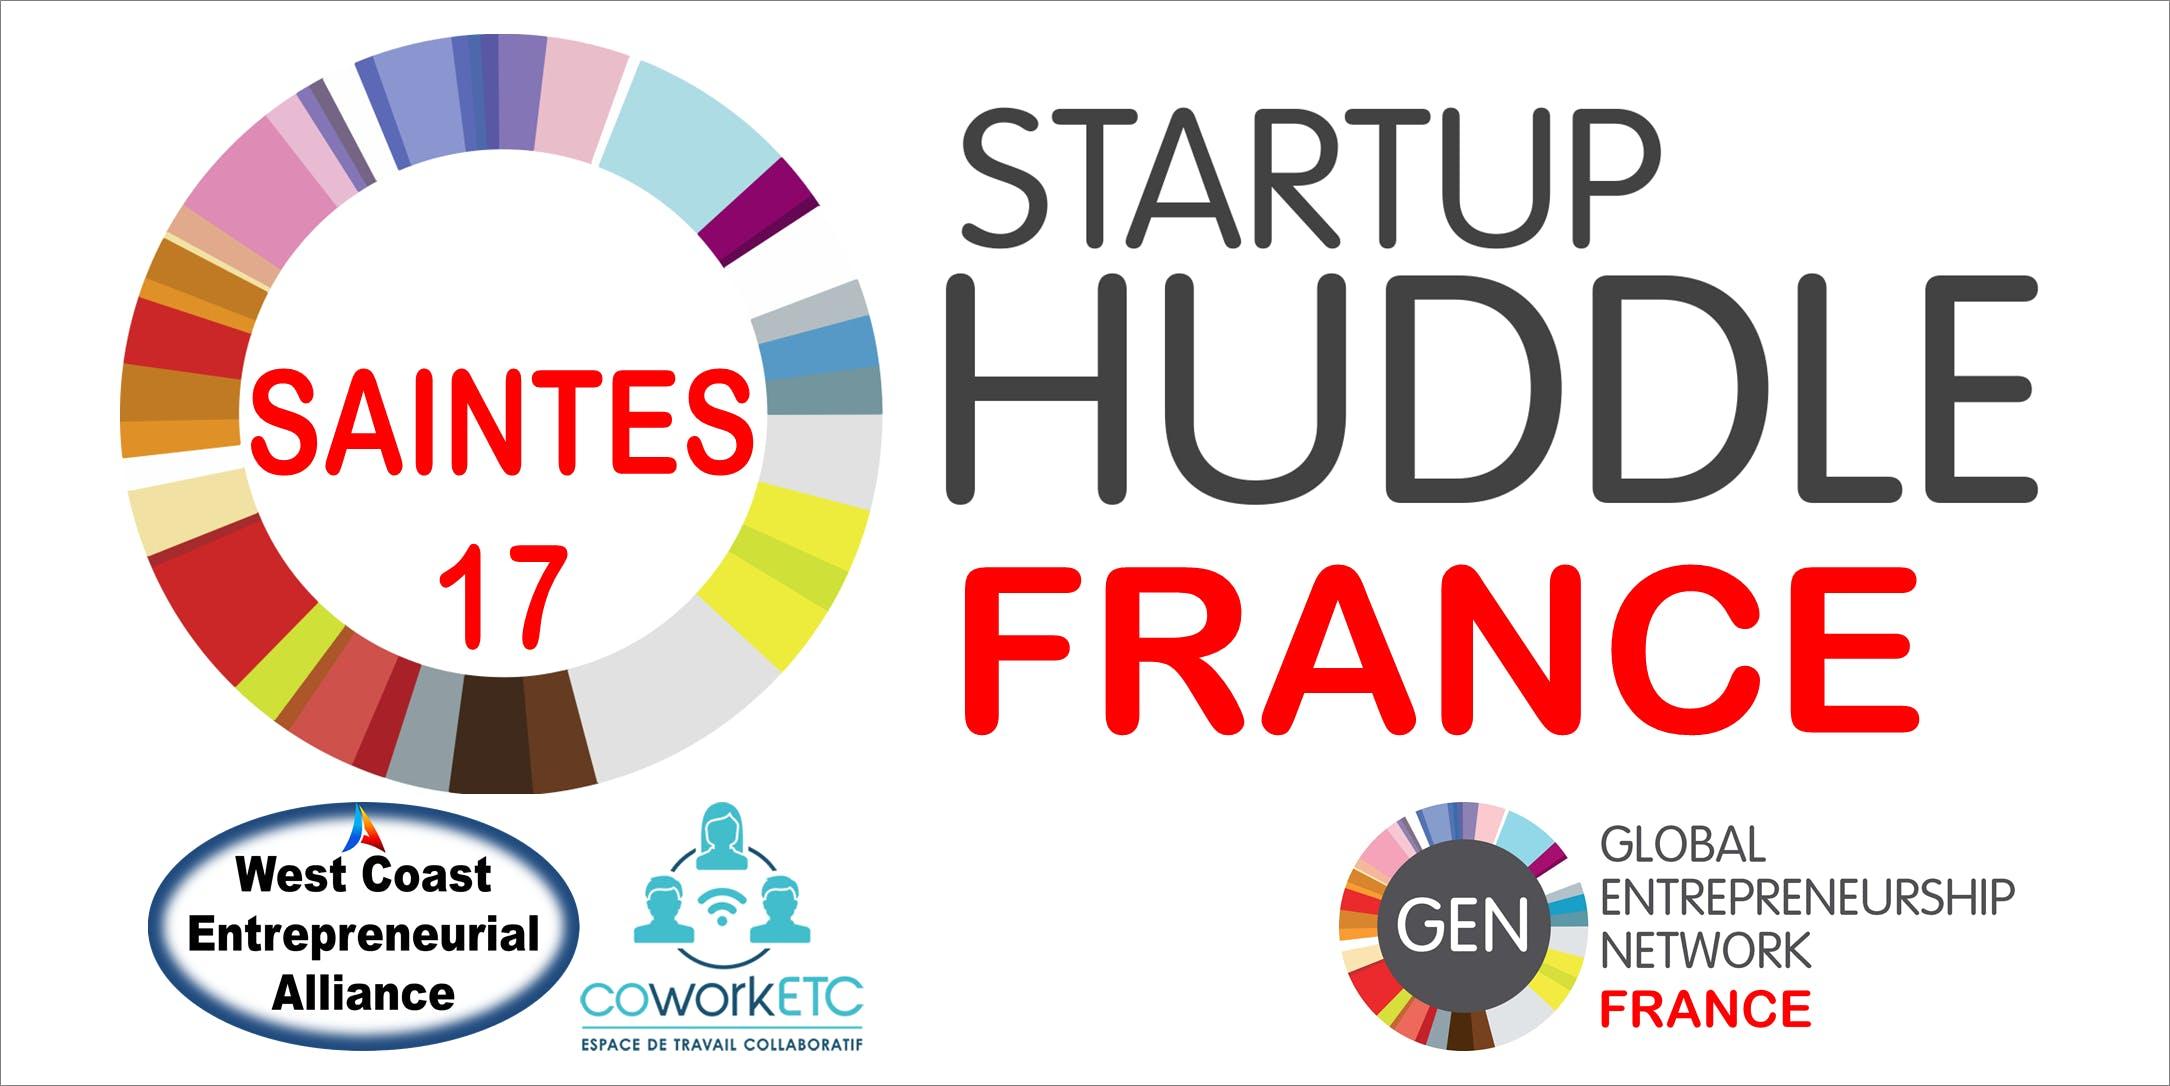 Startup Huddle France Saintes17